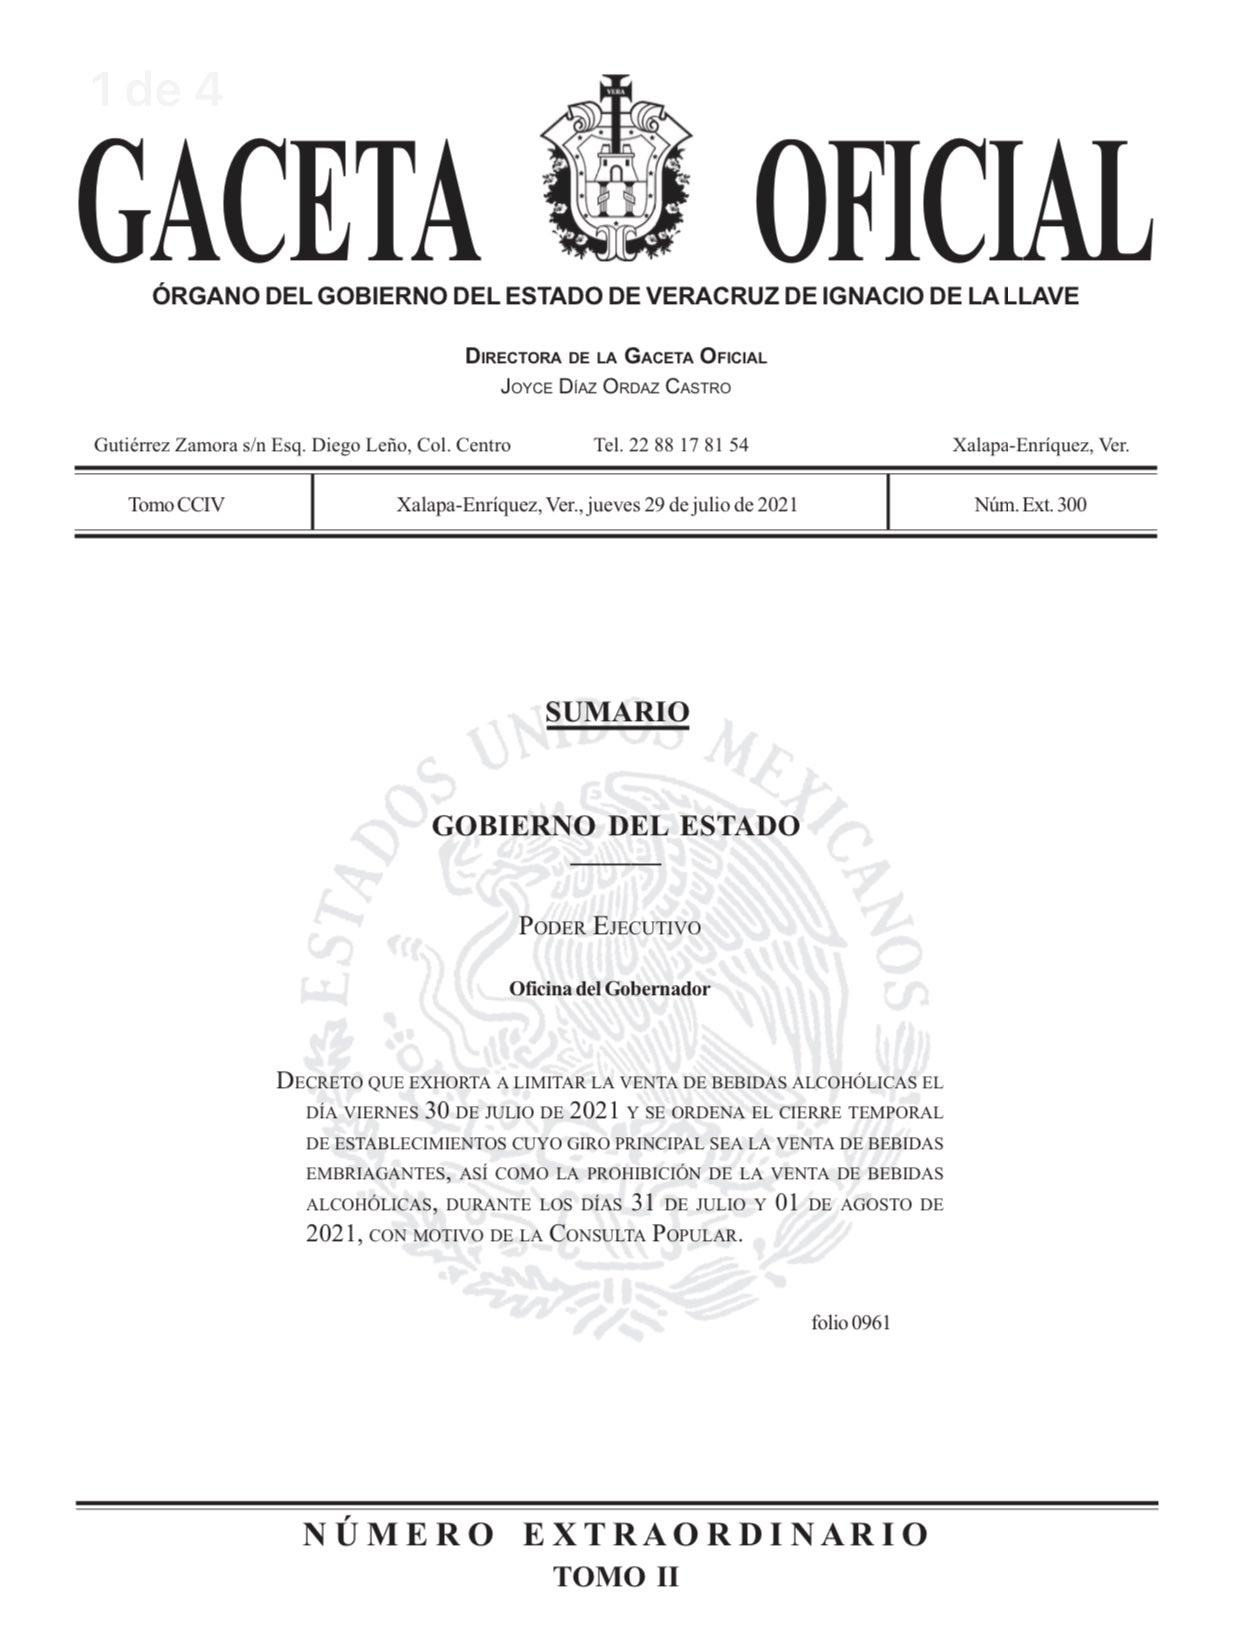 gaceta-oficial-ley-seca-veracruz